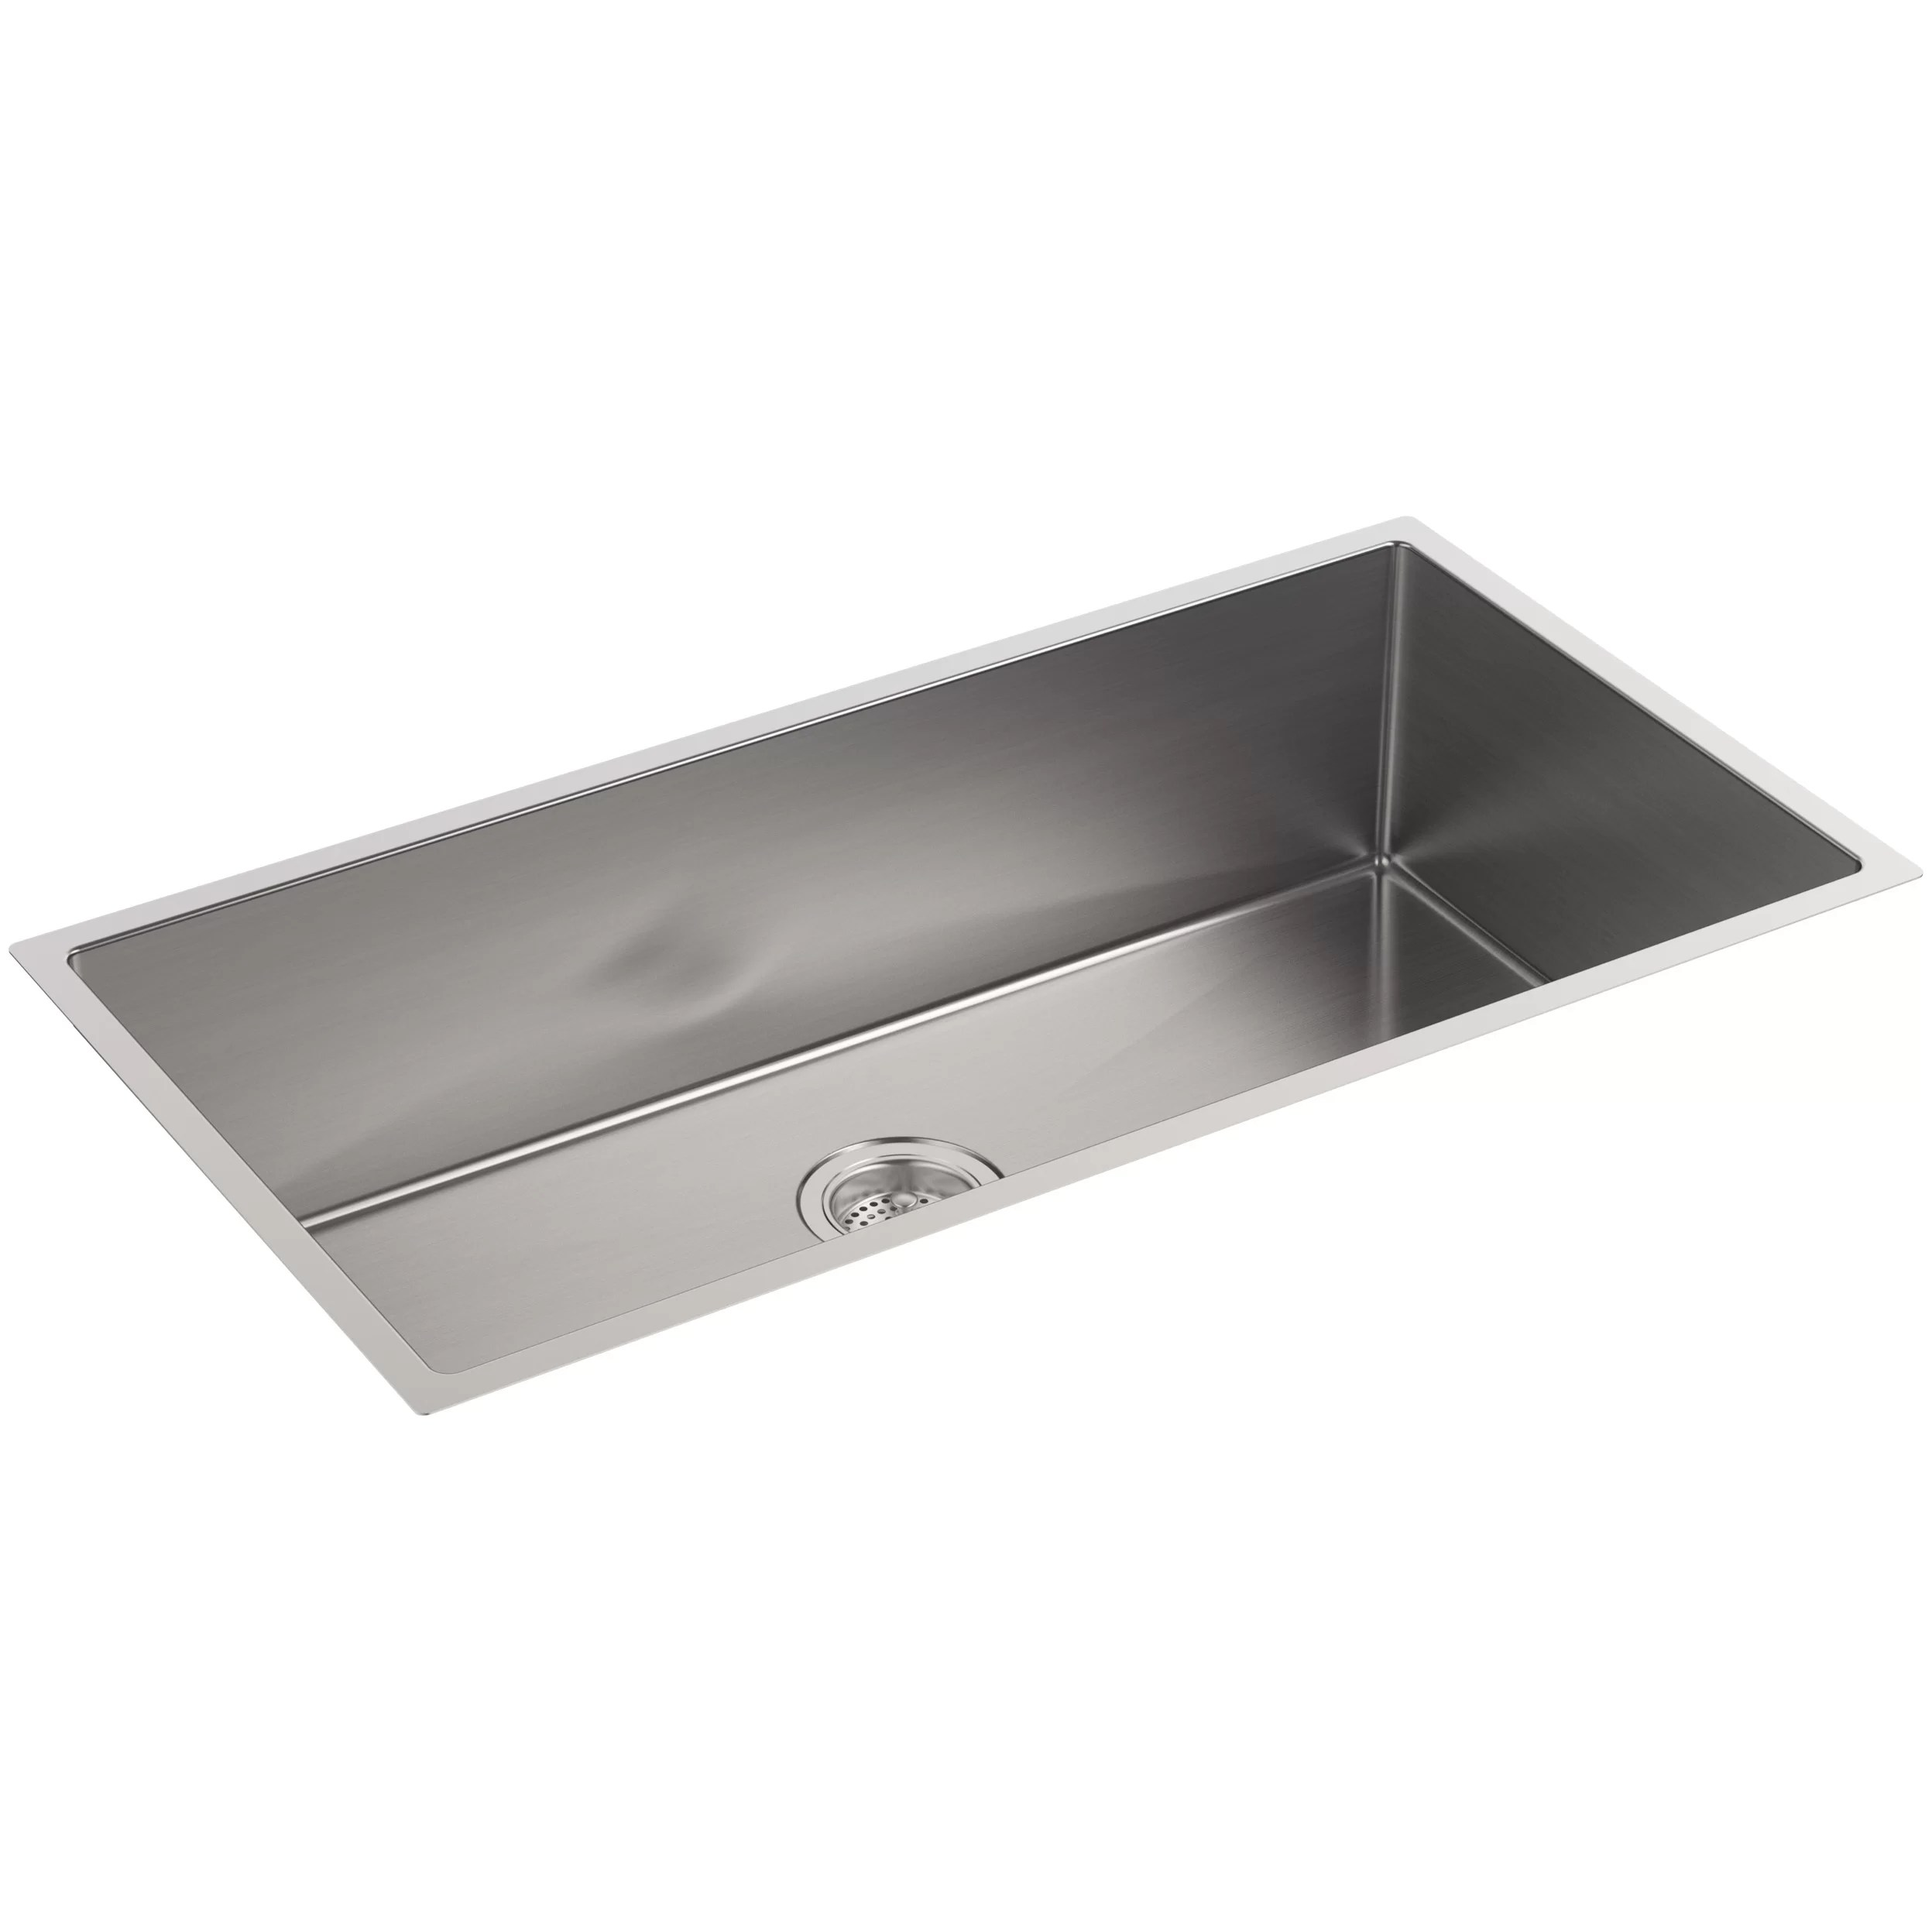 extra large kitchen sink ventilation fan kohler strive 35 quot x 18 5 16 9 under mount